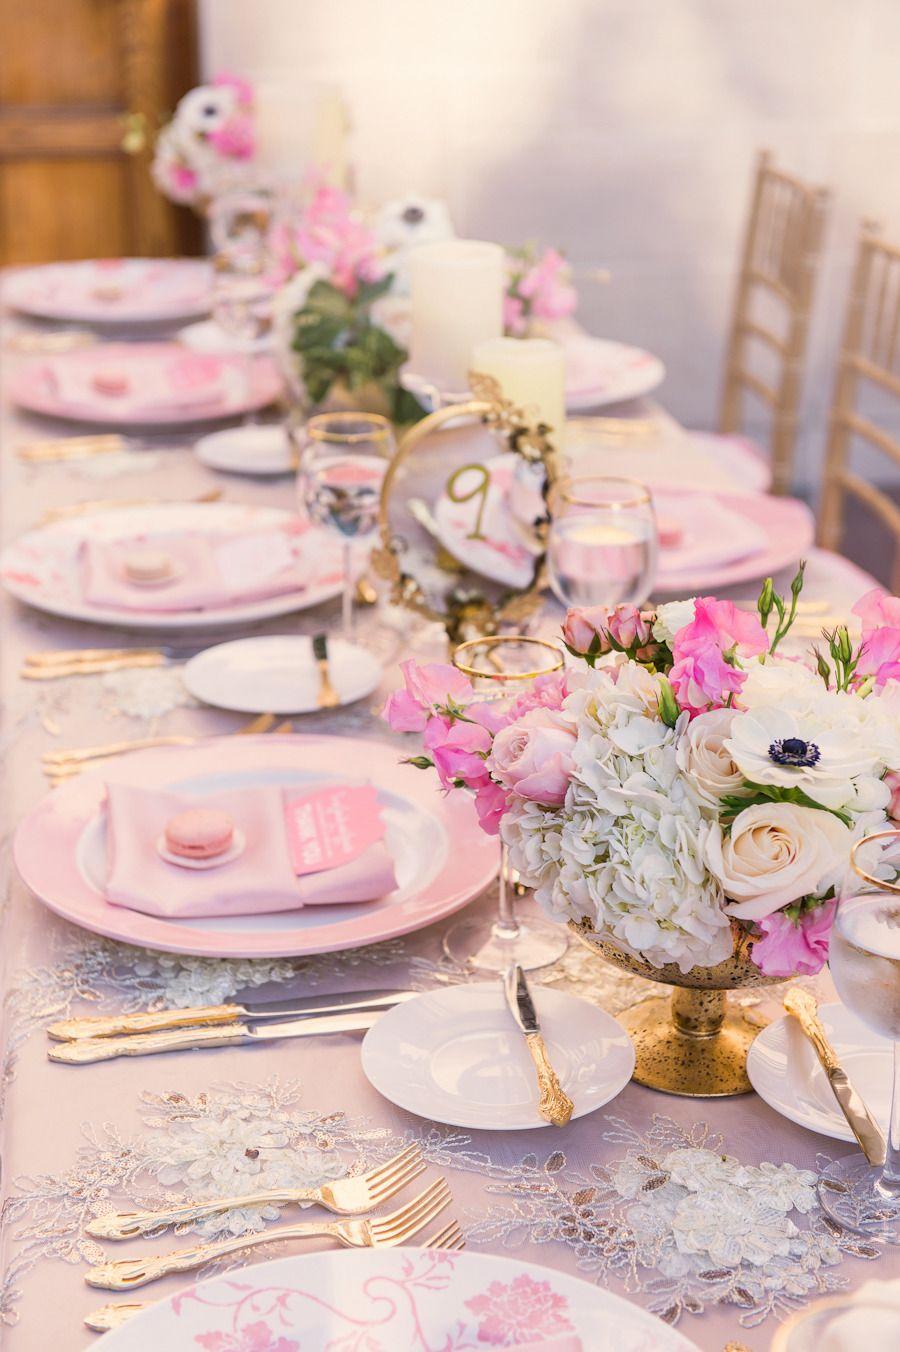 Beverly Hills Wedding At Greystone Mansion Wedding Decorations For Sale Wedding Decorations Gold Wedding Decorations